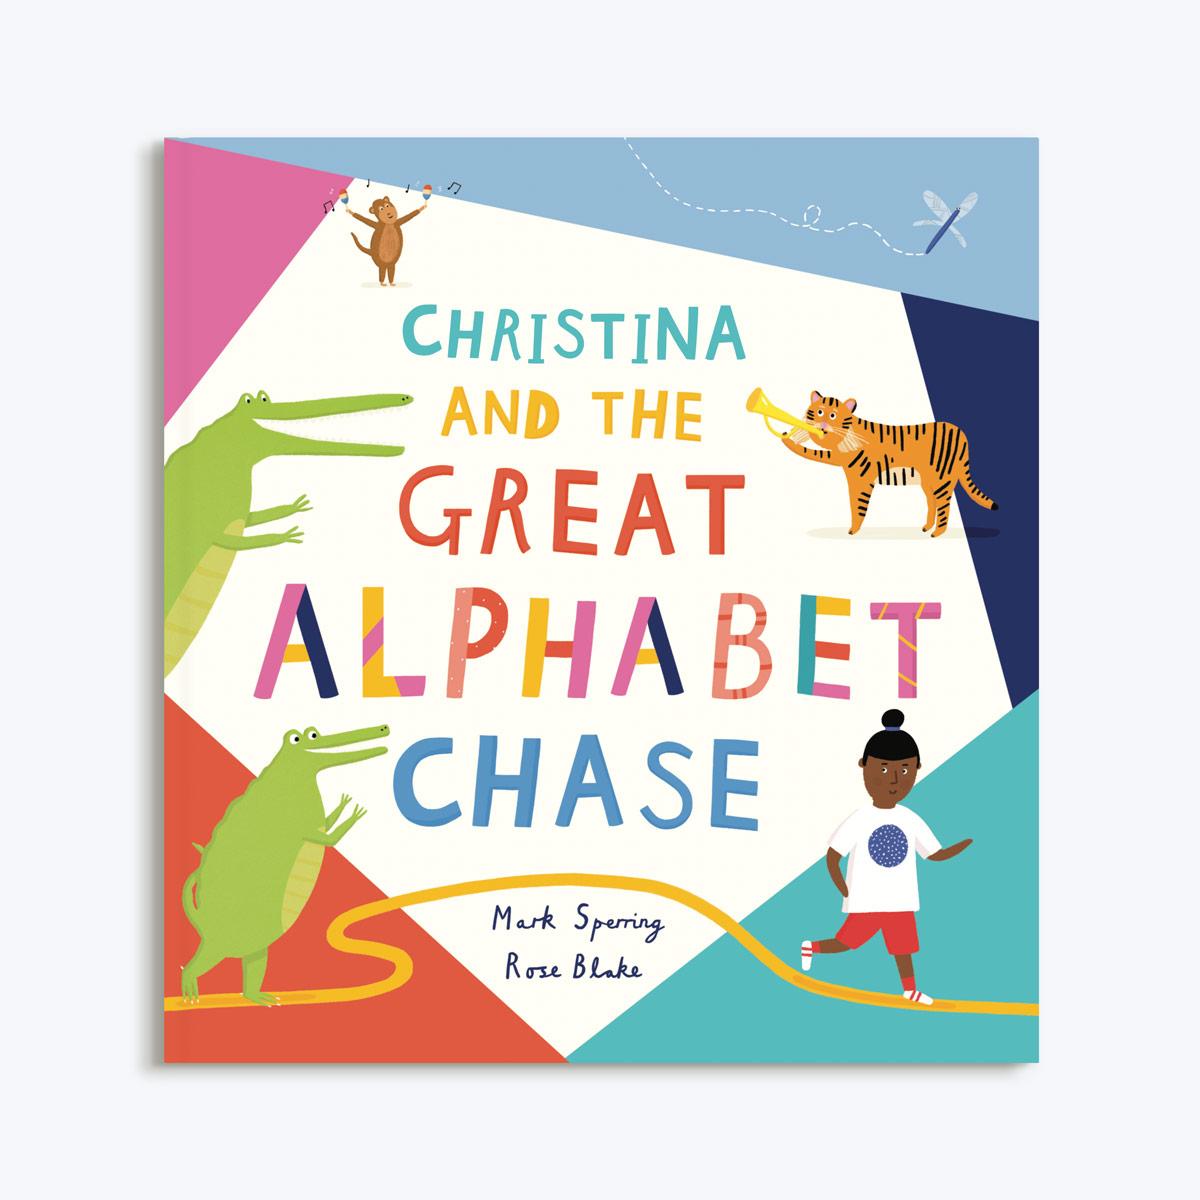 Alphabet chase